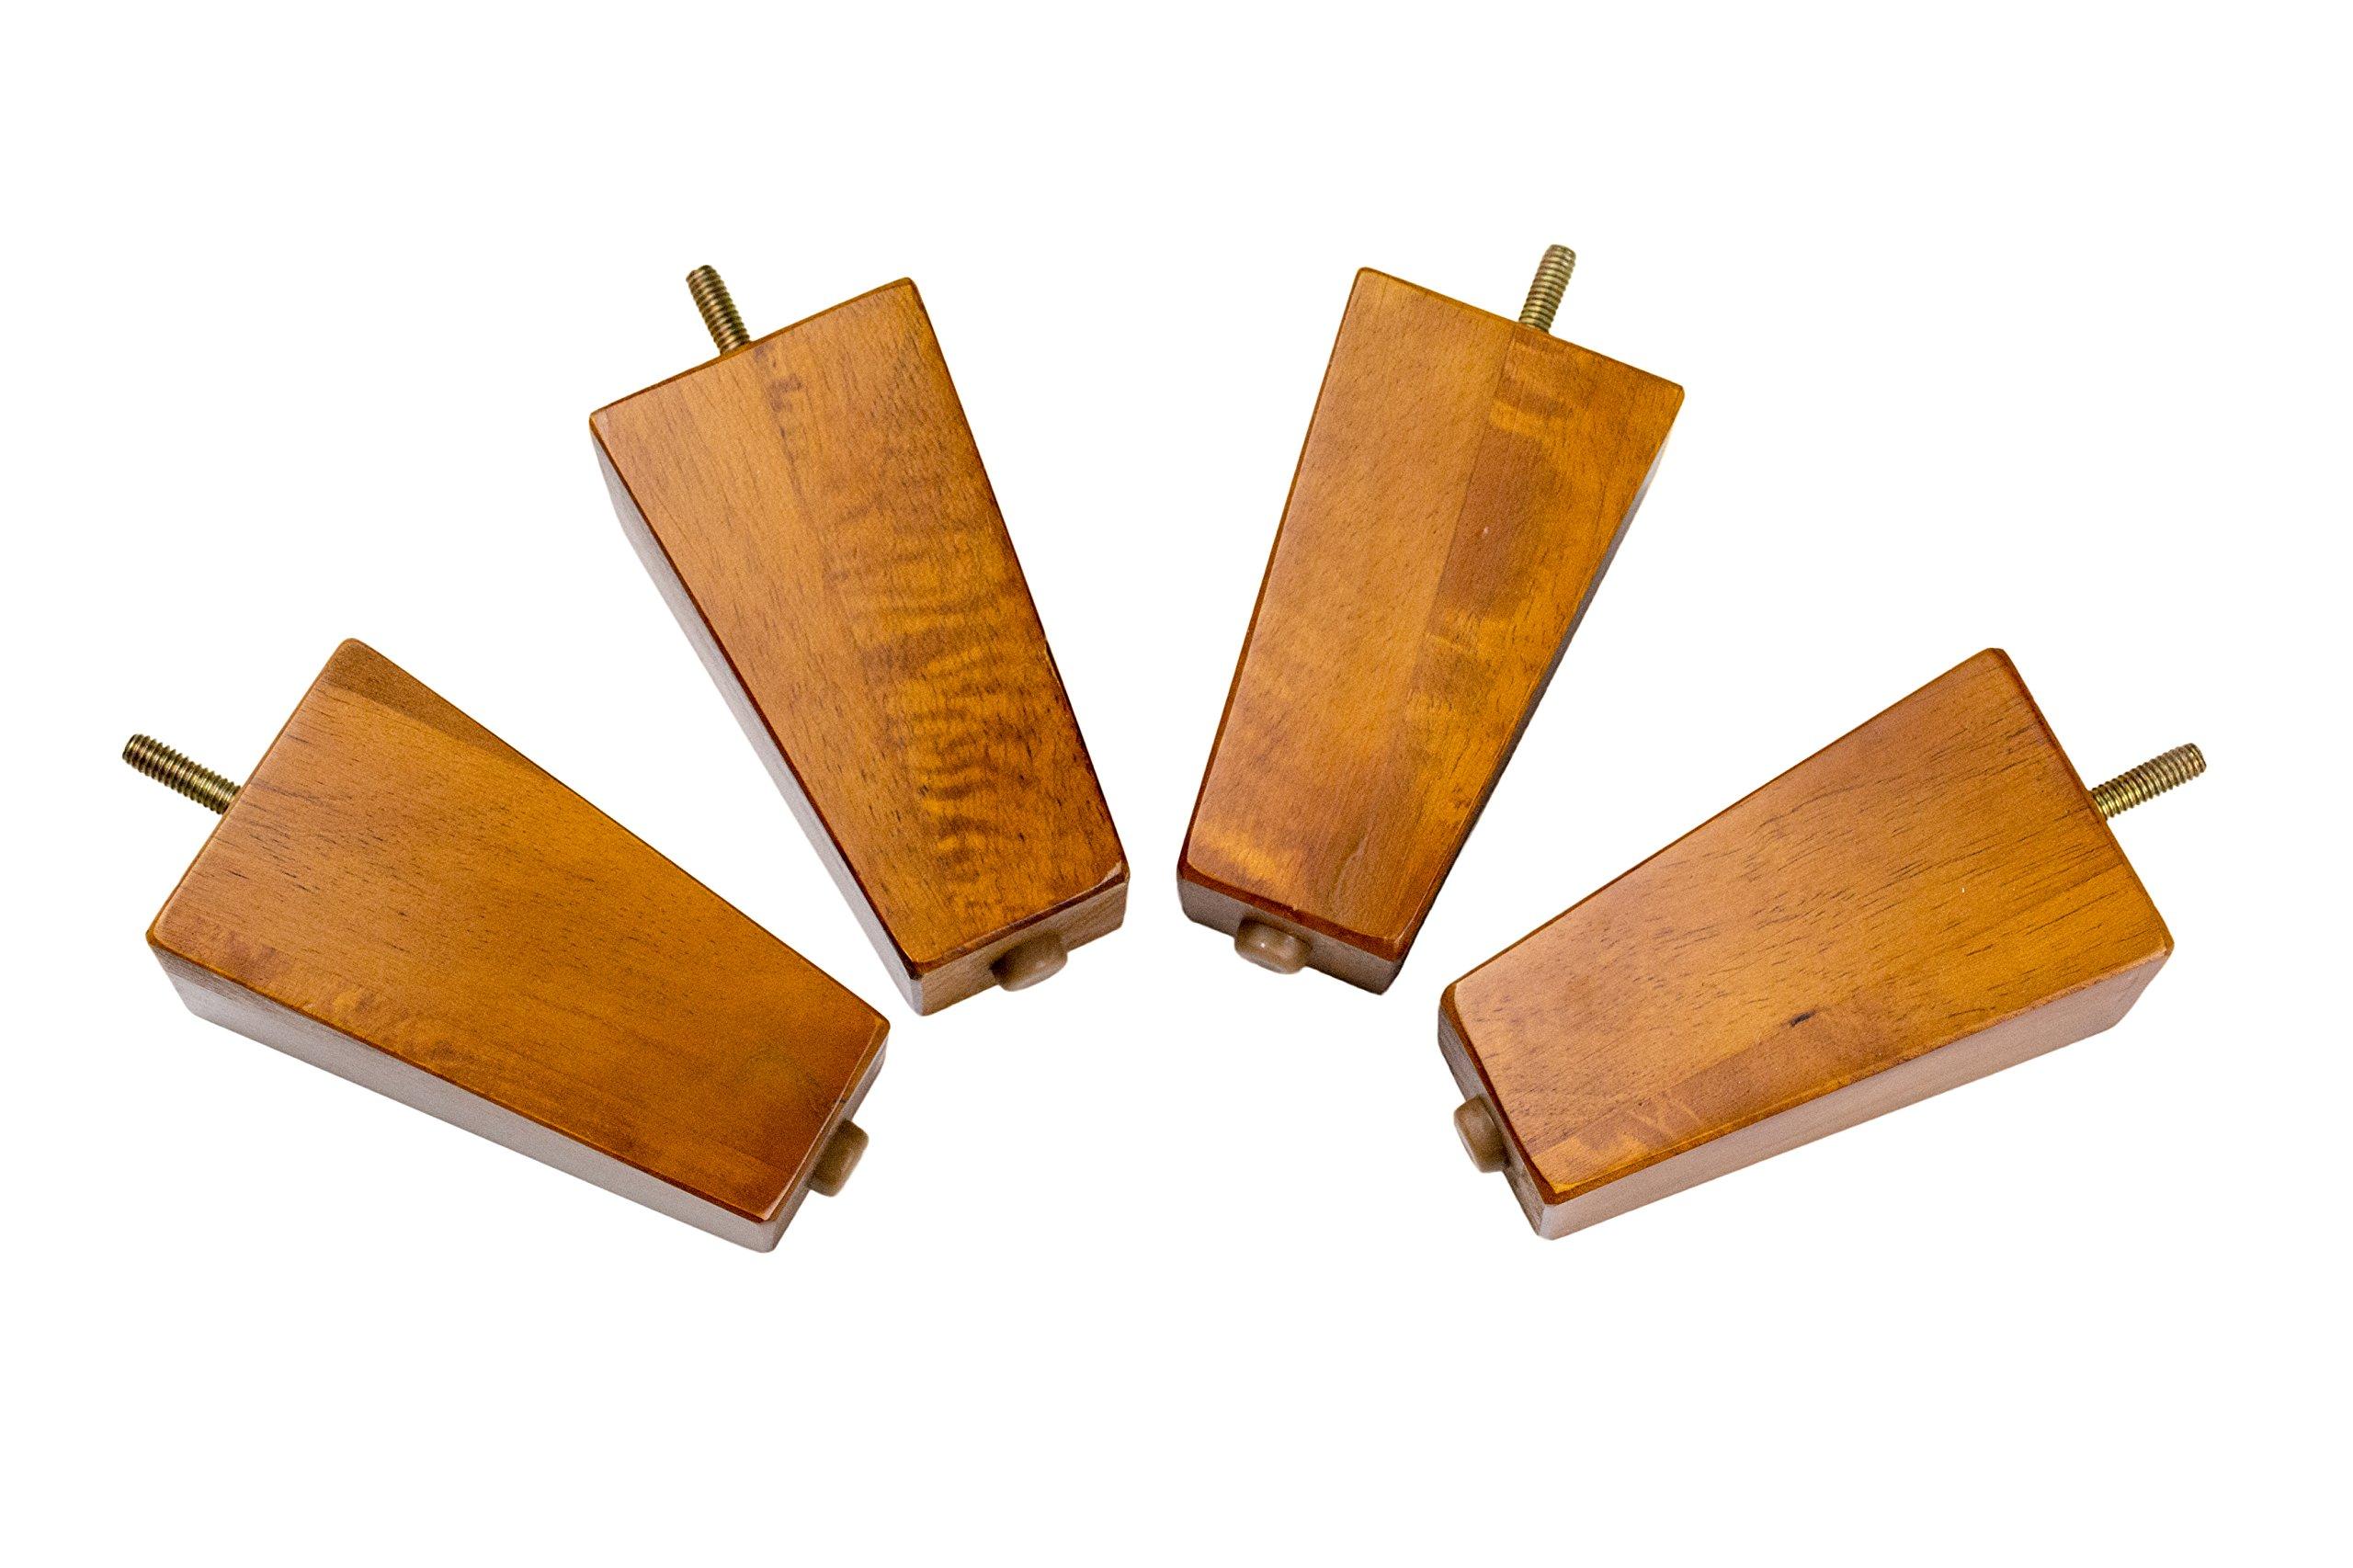 MJL Furniture Designs Medium Wooden Square/Block Shaped Replacement Sofa or Ottoman Threaded Leg (Set of 4), Pecan, 5'' x 2-3/4'' x 1-3/4''